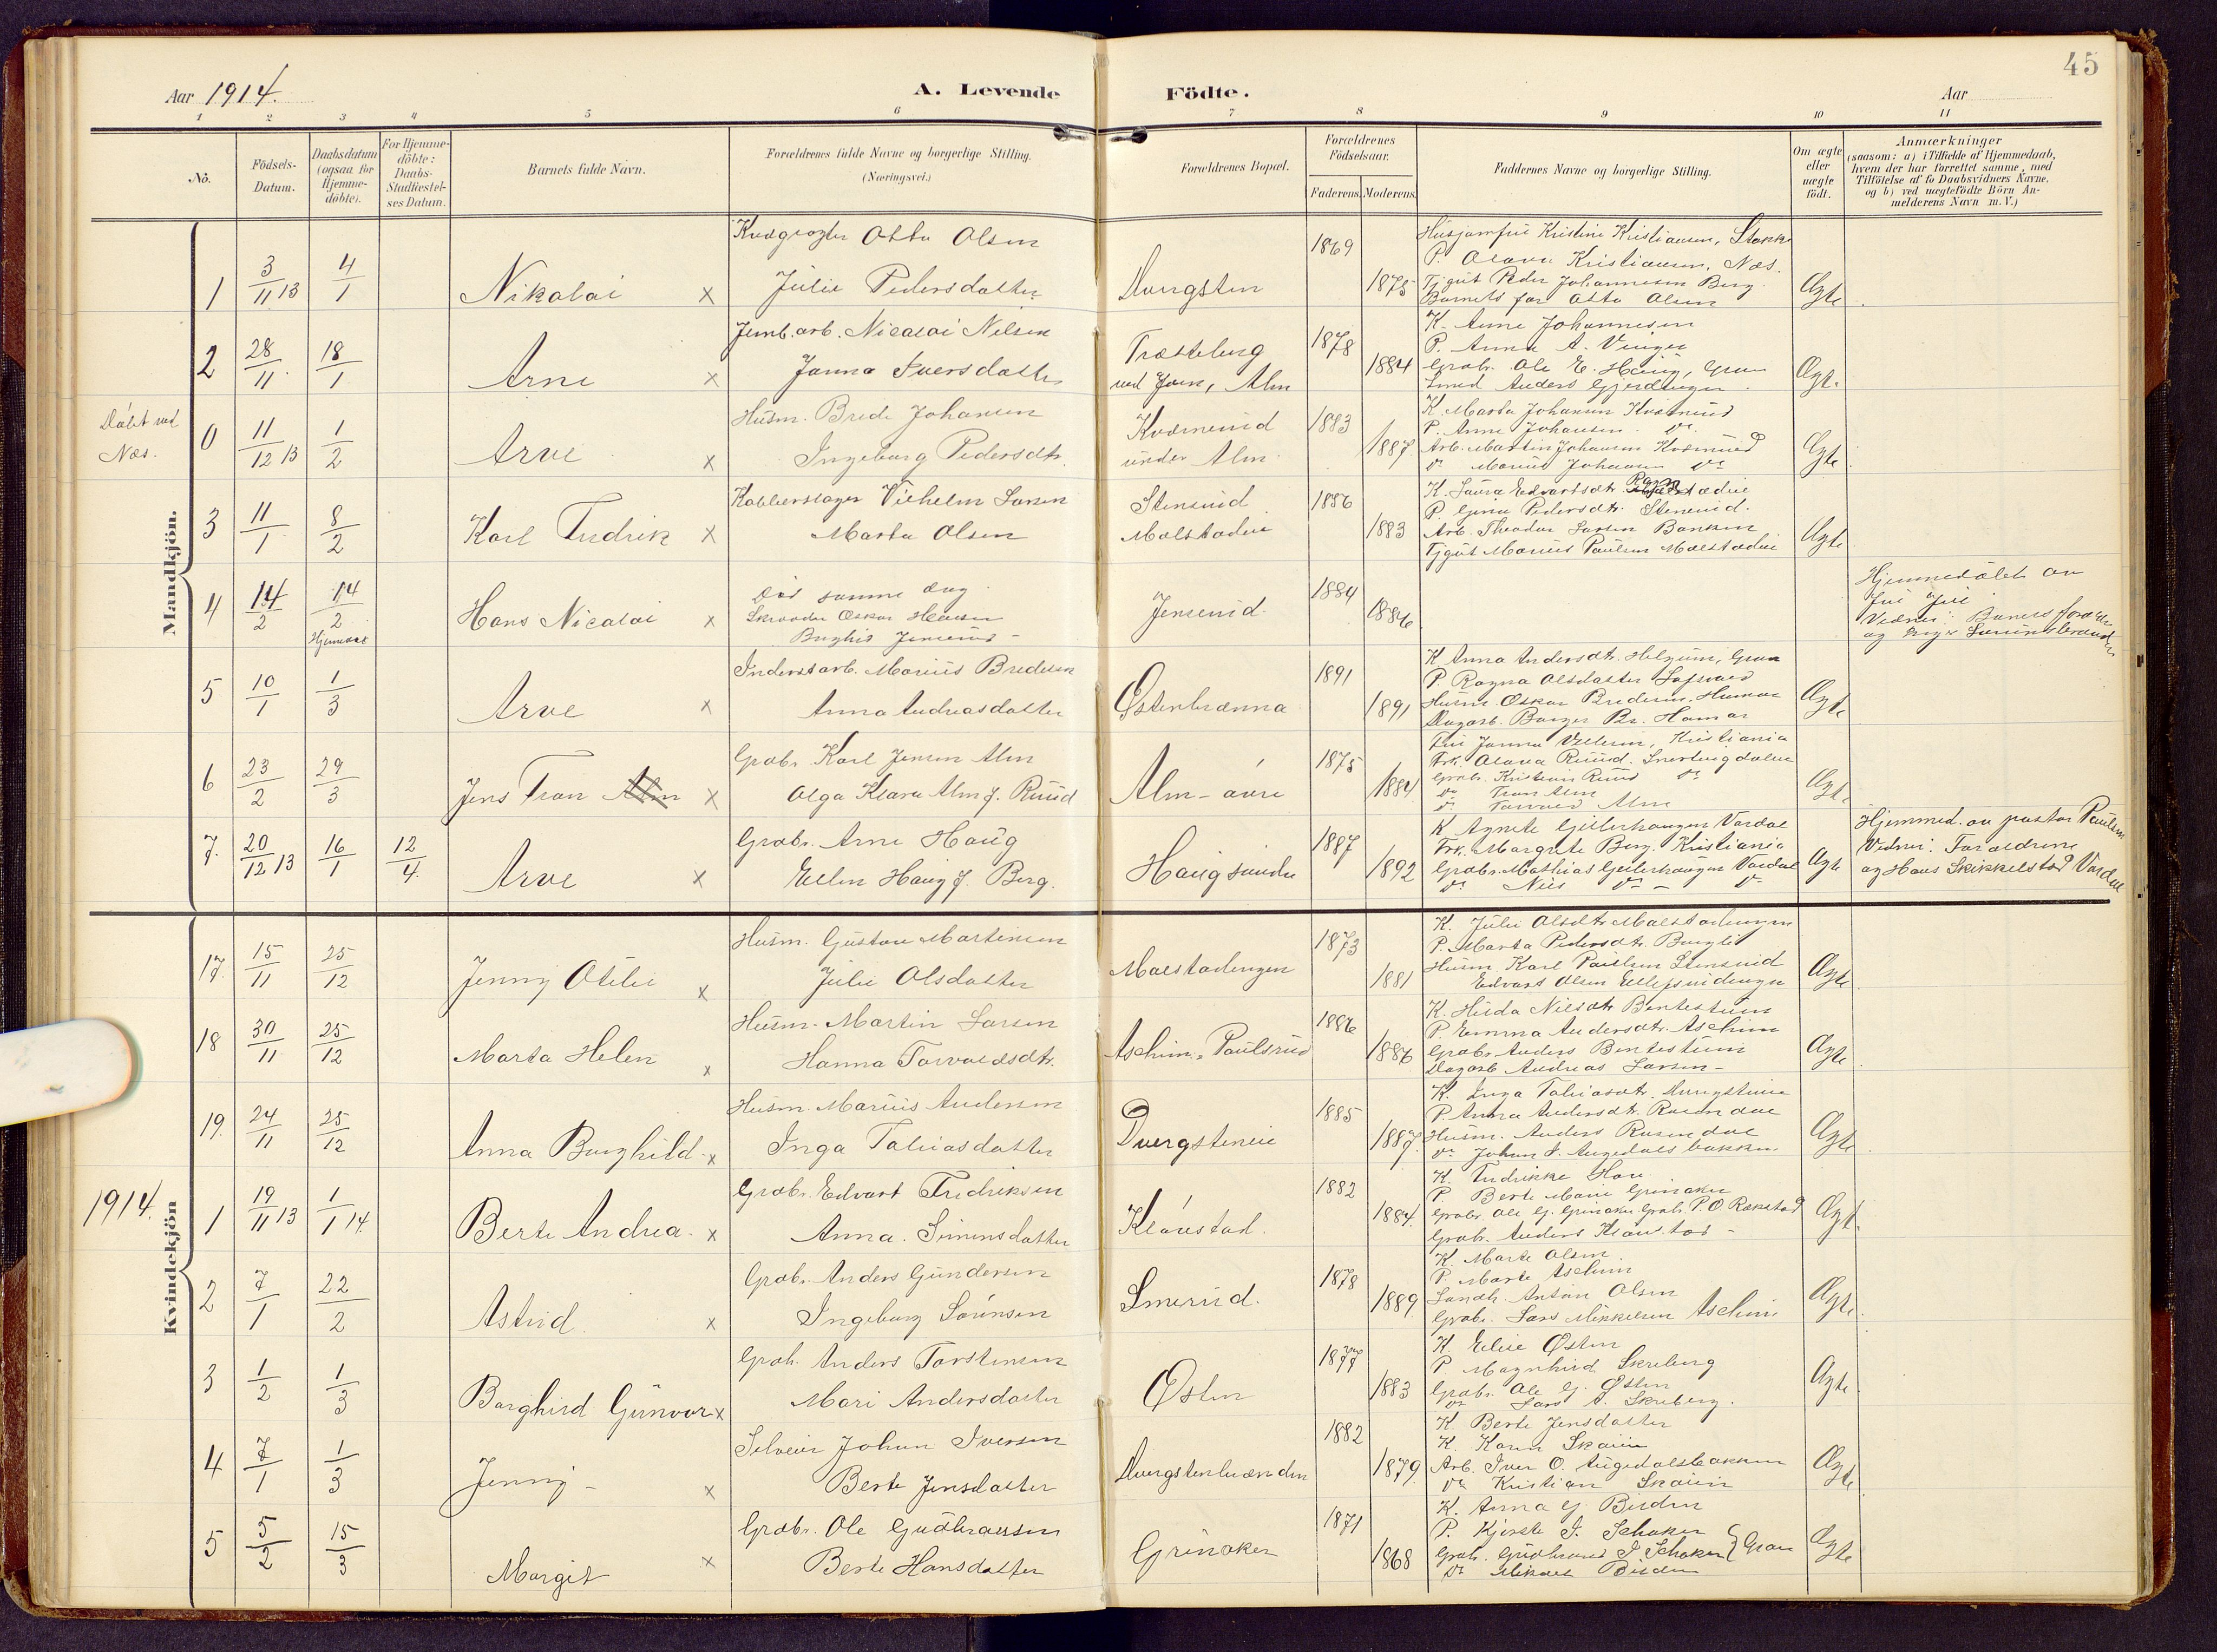 SAH, Brandbu prestekontor, Klokkerbok nr. 9, 1903-1916, s. 45